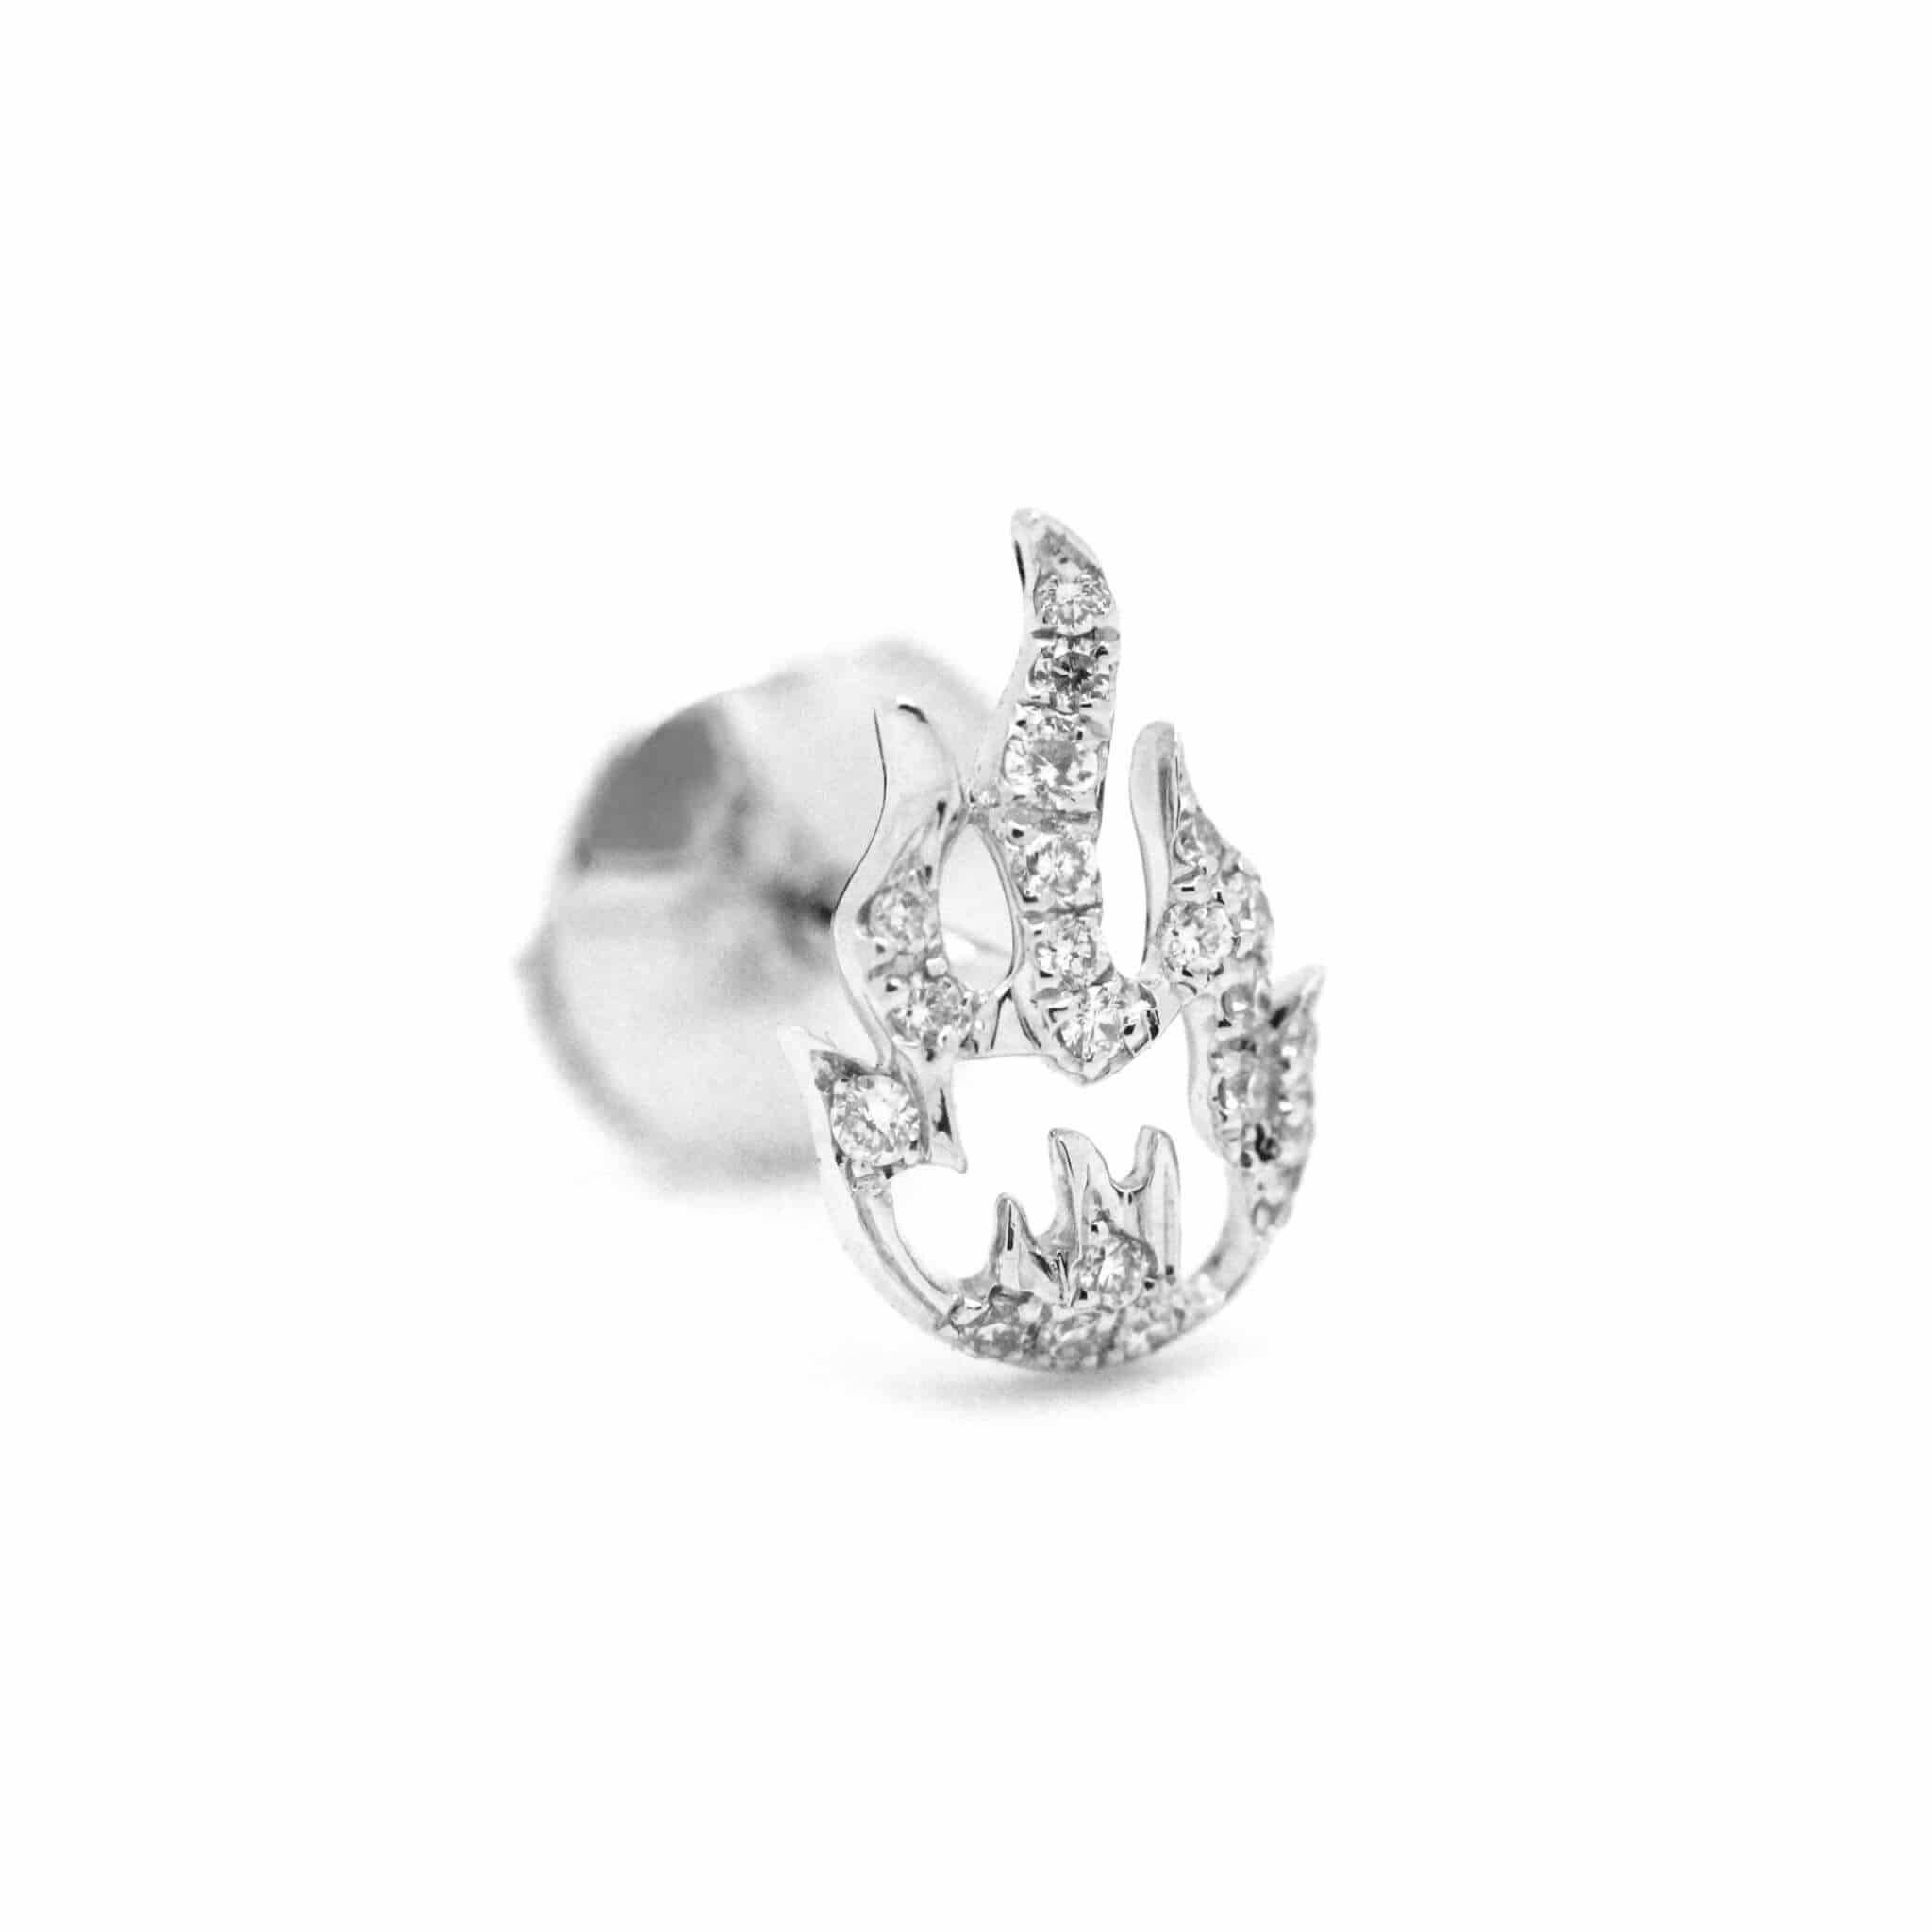 Flamme boucle d'oreille or blanc diamant